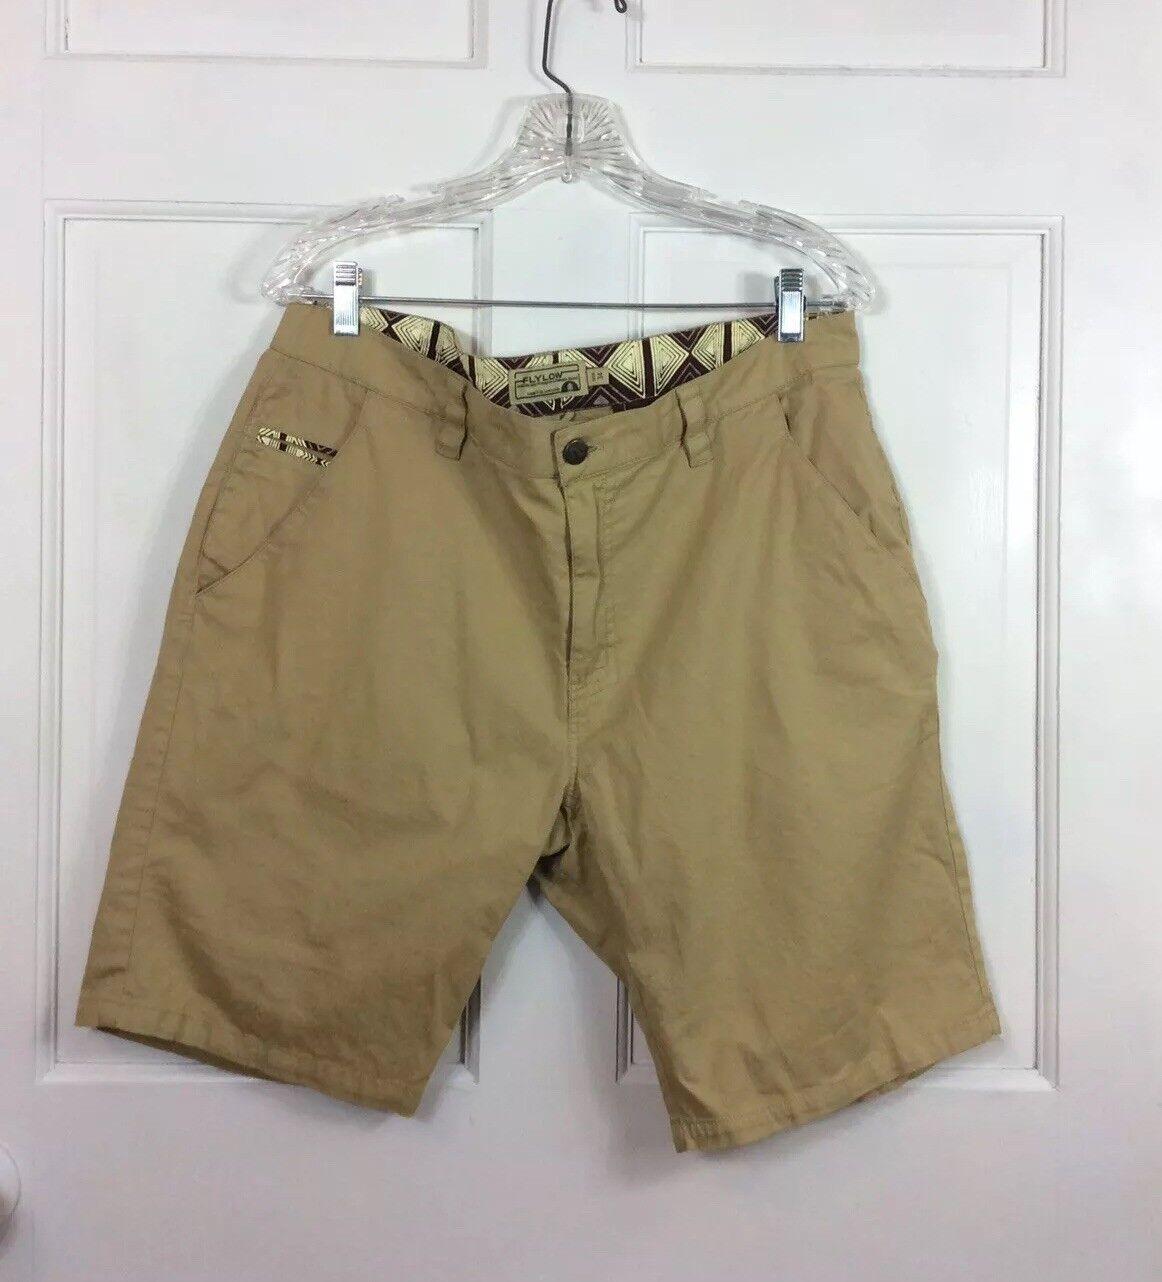 FLYLOW Khaki Shorts Cotton Men's 34 puhvec18003 Shorts